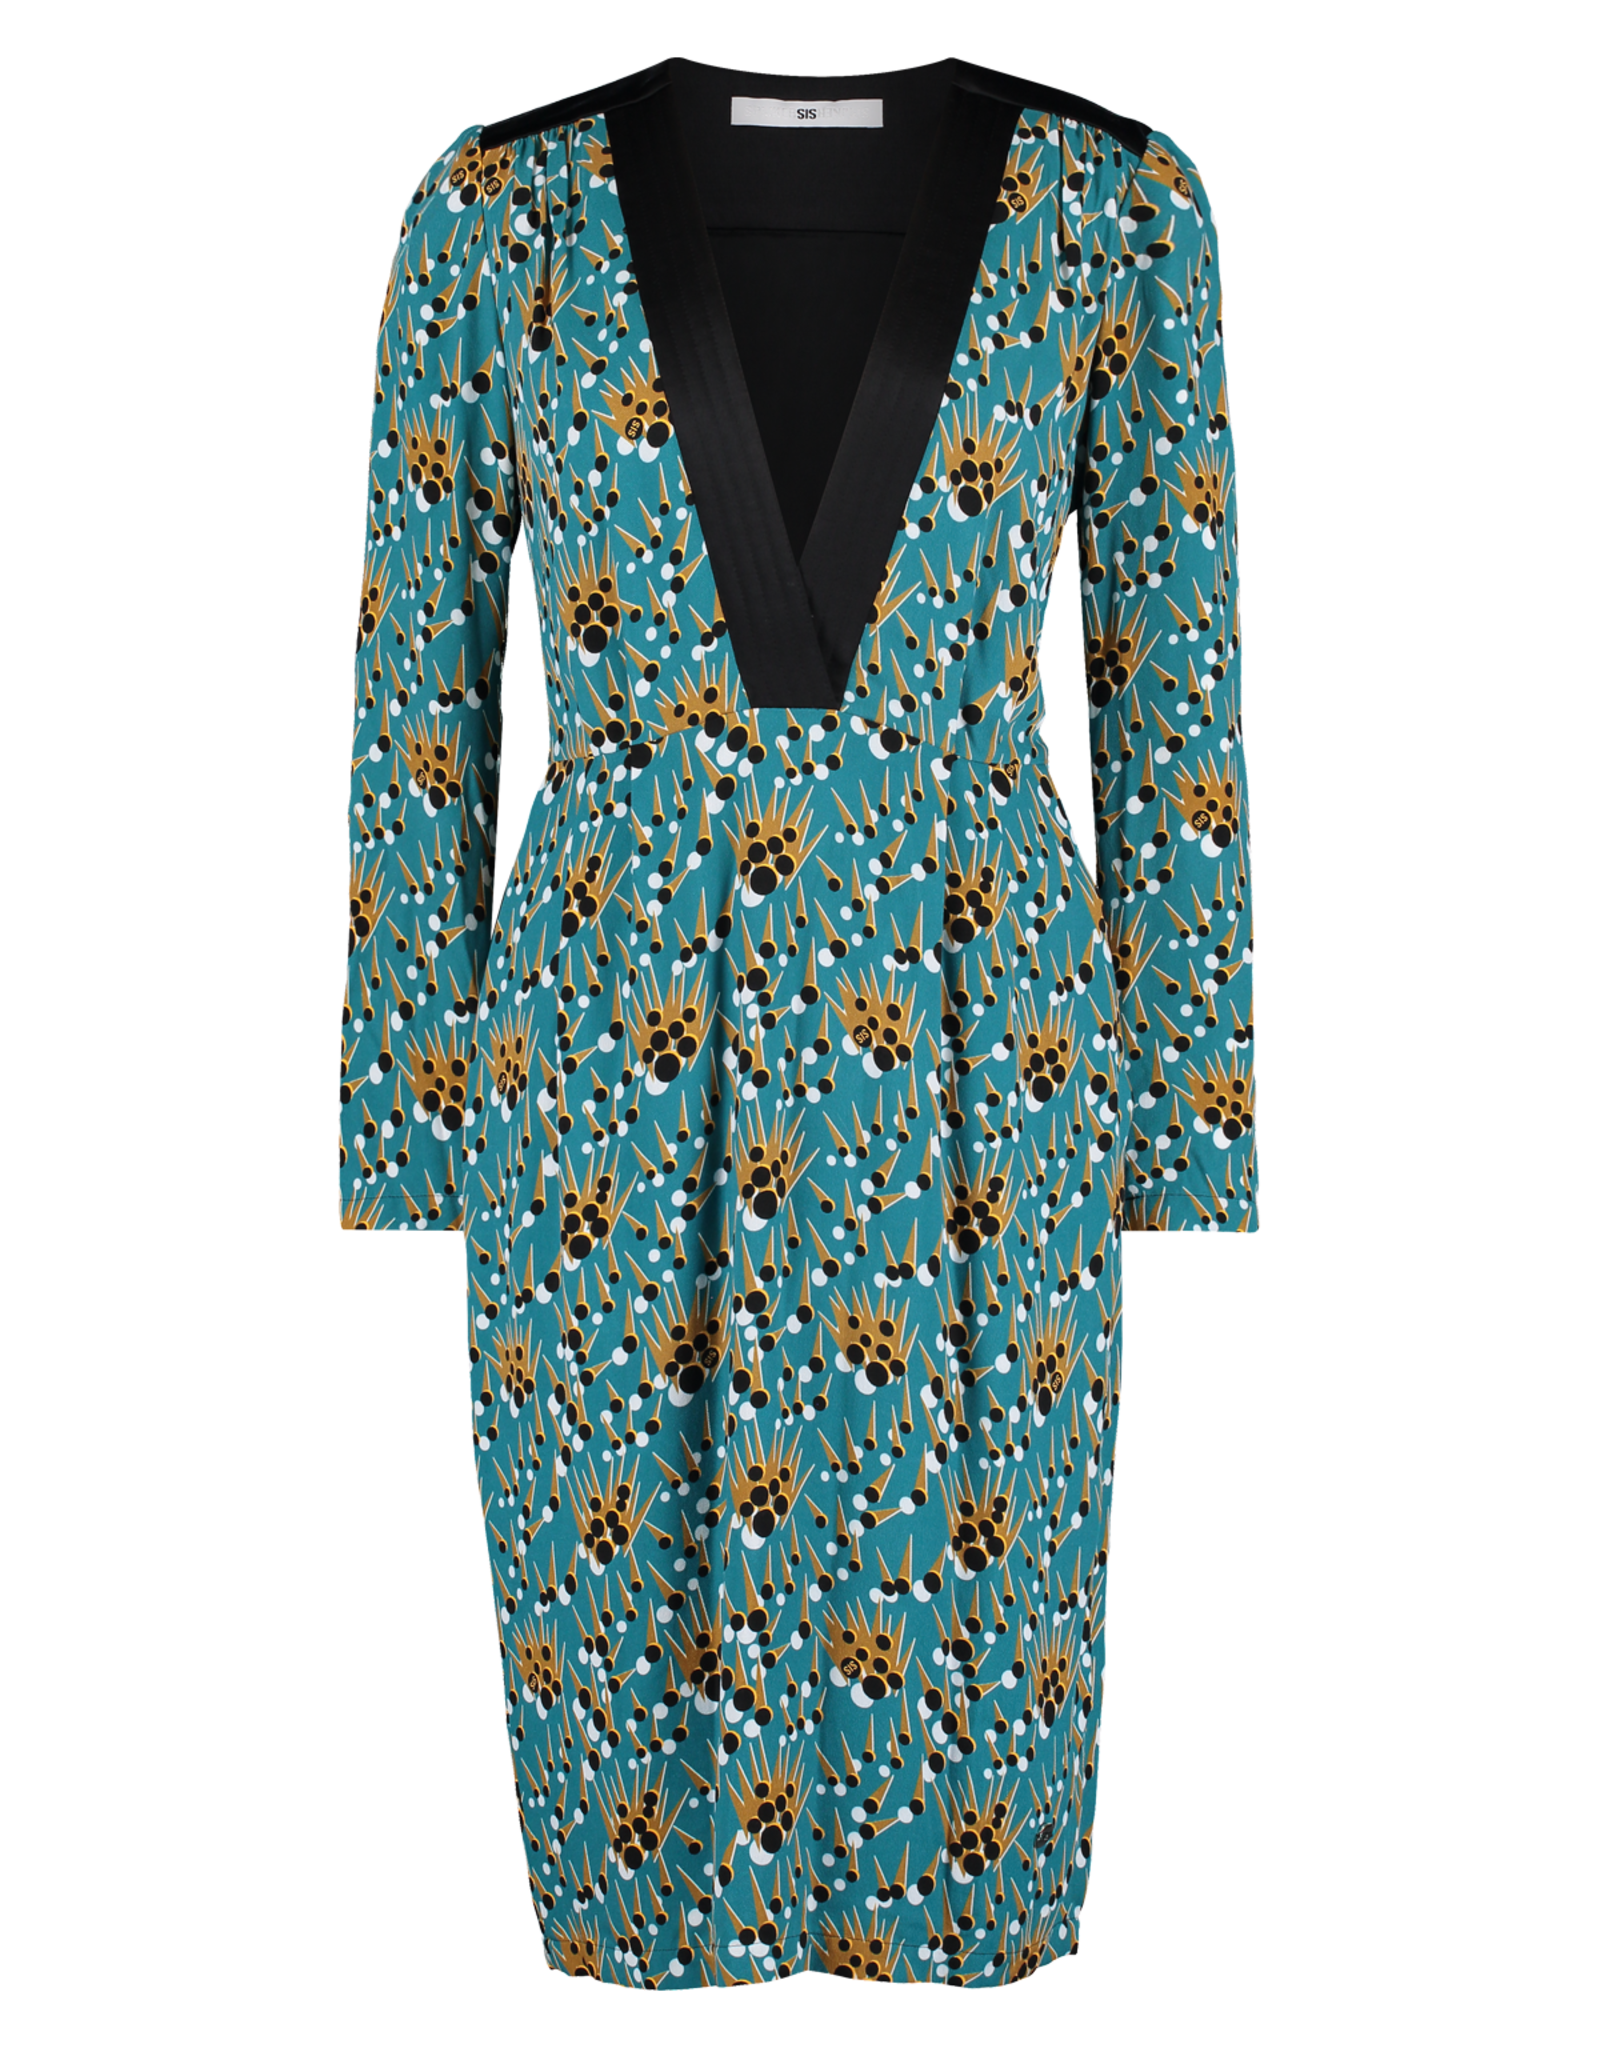 AW1920 544-N Padded Lewis Dress